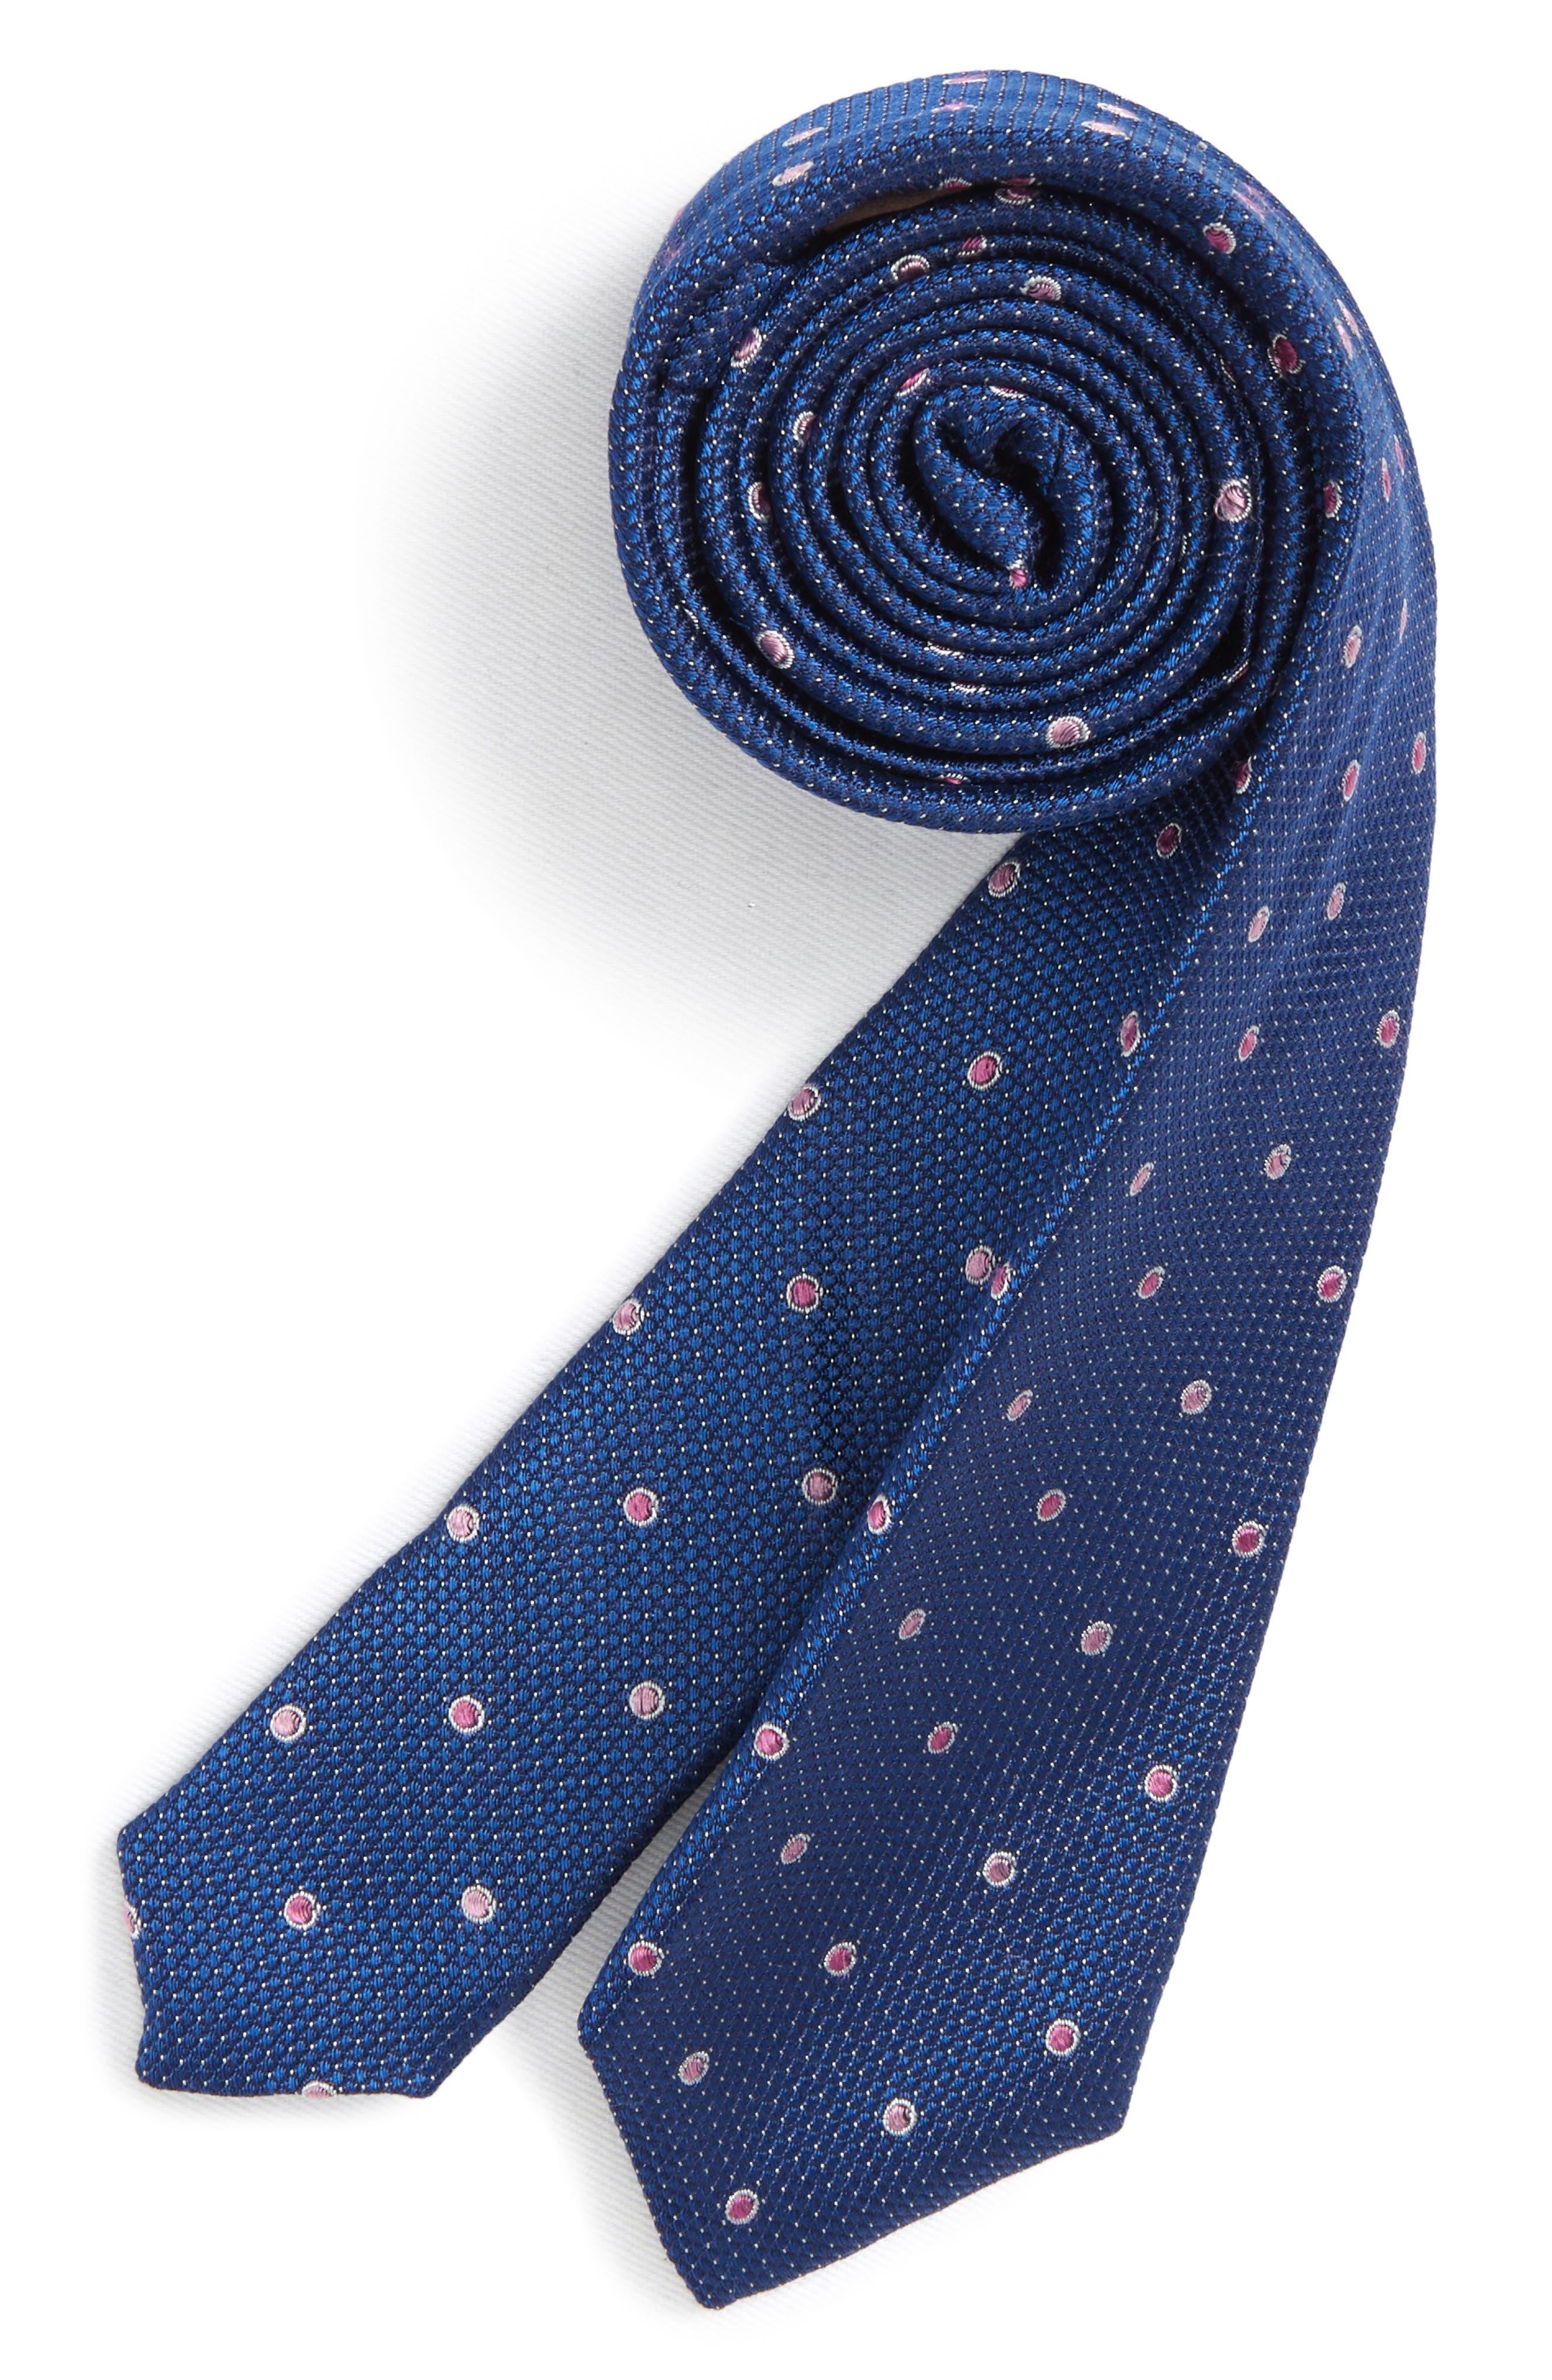 MICHAEL KORS Dot Print Silk Tie, Main, color, 400